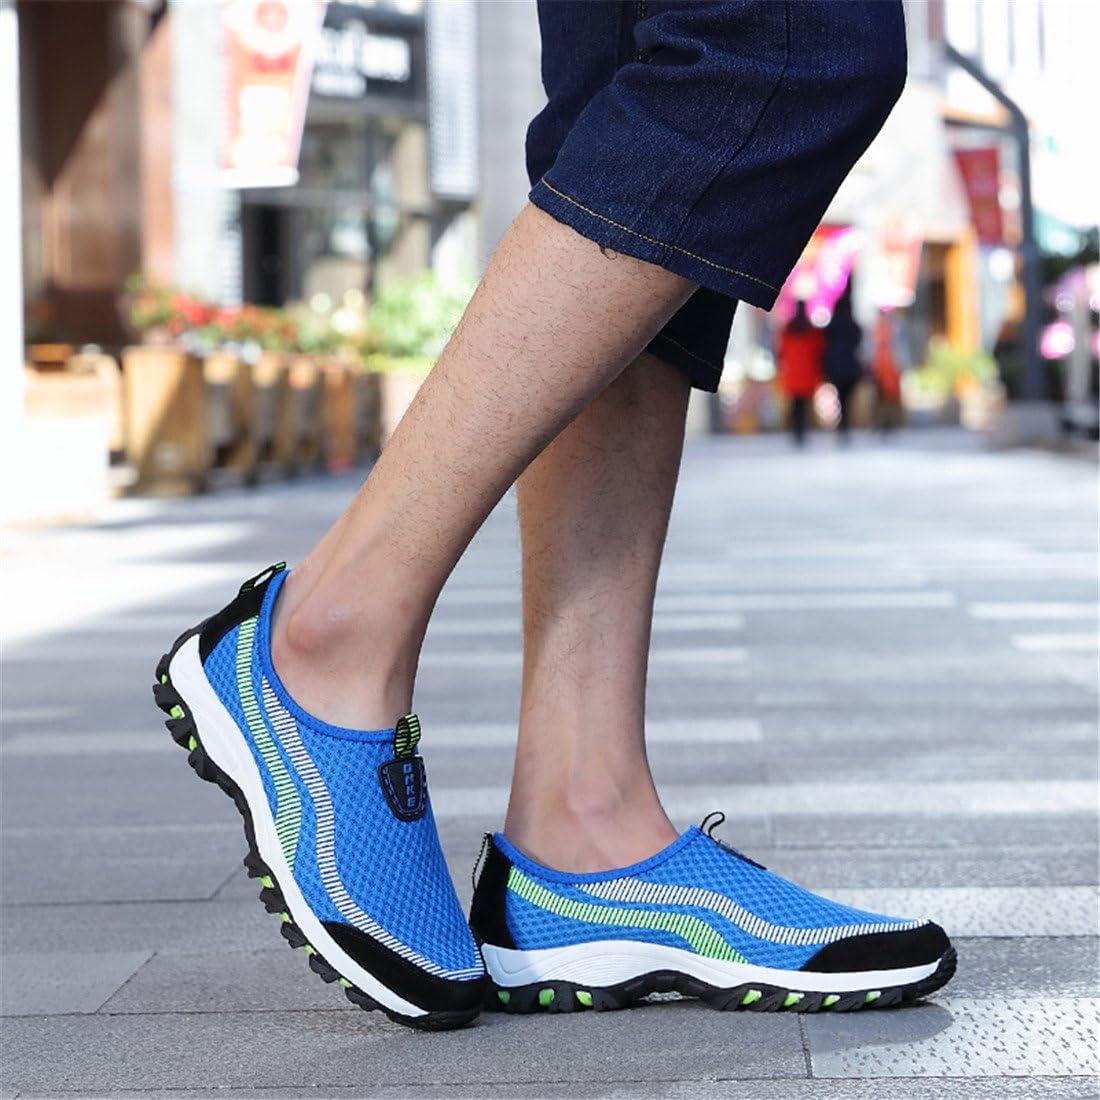 DorkasDE Mesh Schuhe Atmungsaktiv Wassersportschuhe Sneaker Strandschuhe f/ür Damen Herren Kinder